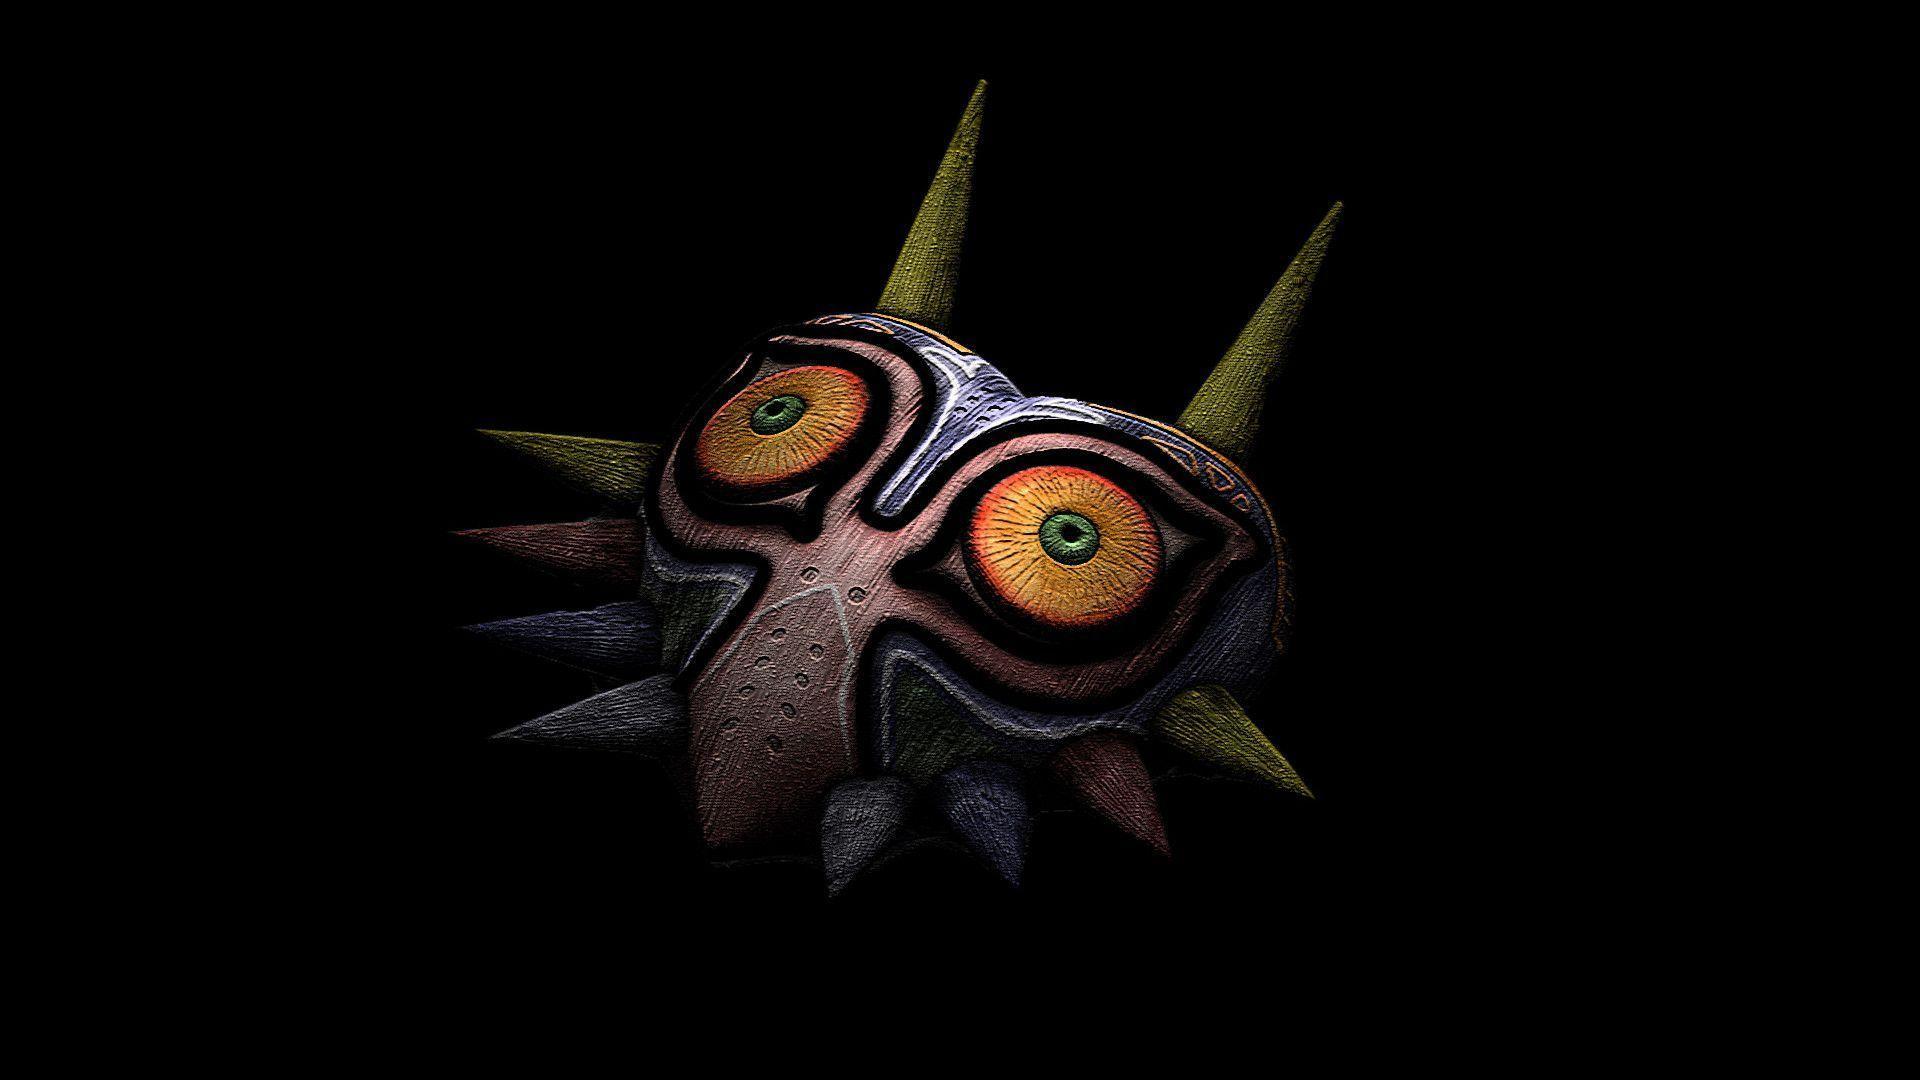 20 The Legend Of Zelda Majoras Mask Wallpapers